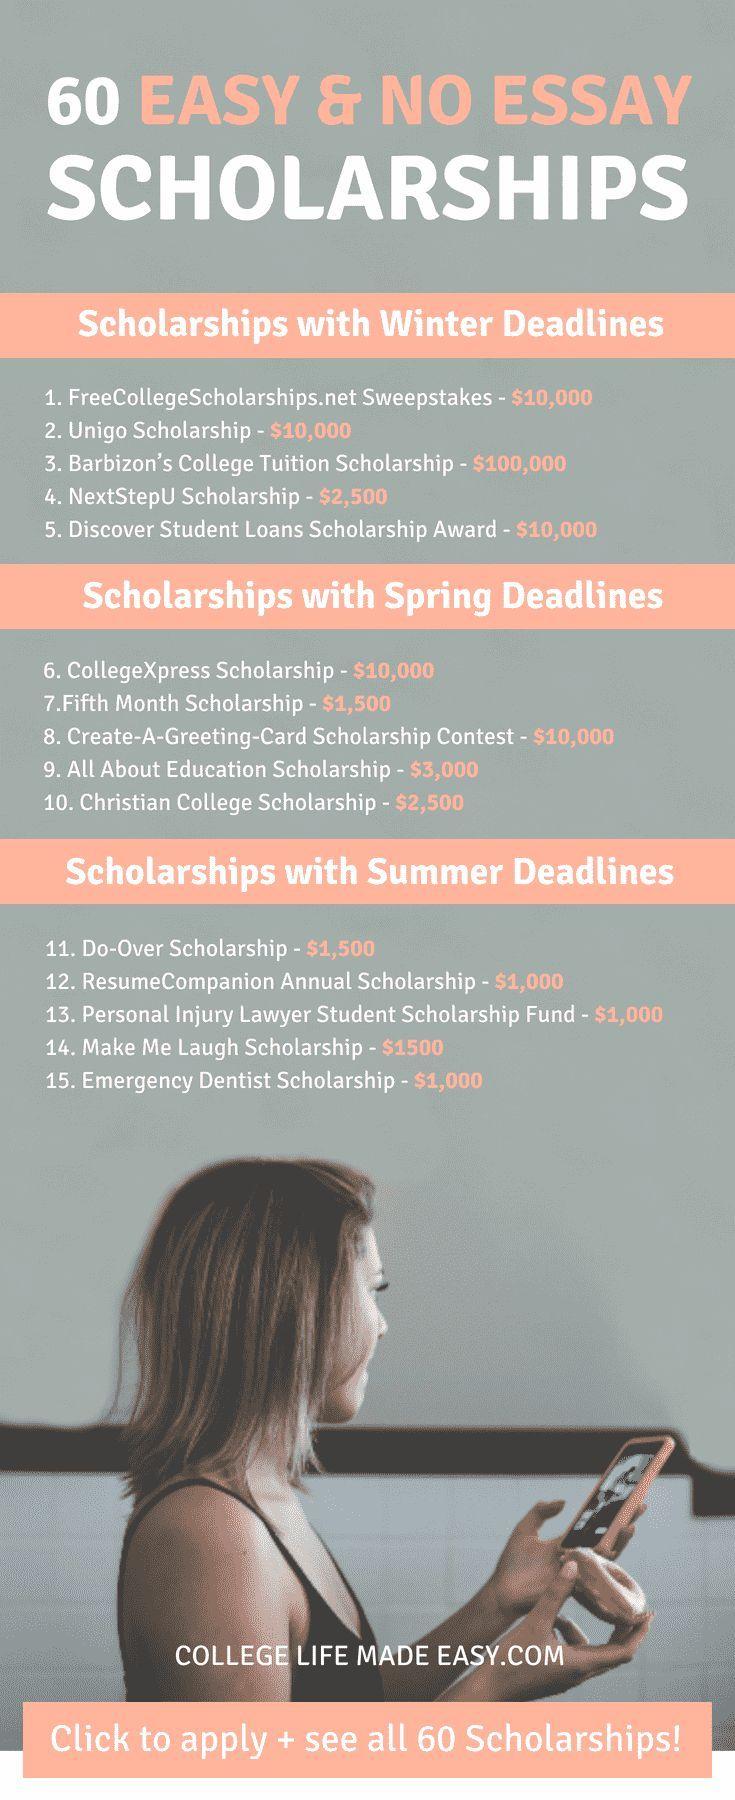 009 No Essay College Scholarships Imposing For Freshmen Easy Scholarship Legit Full